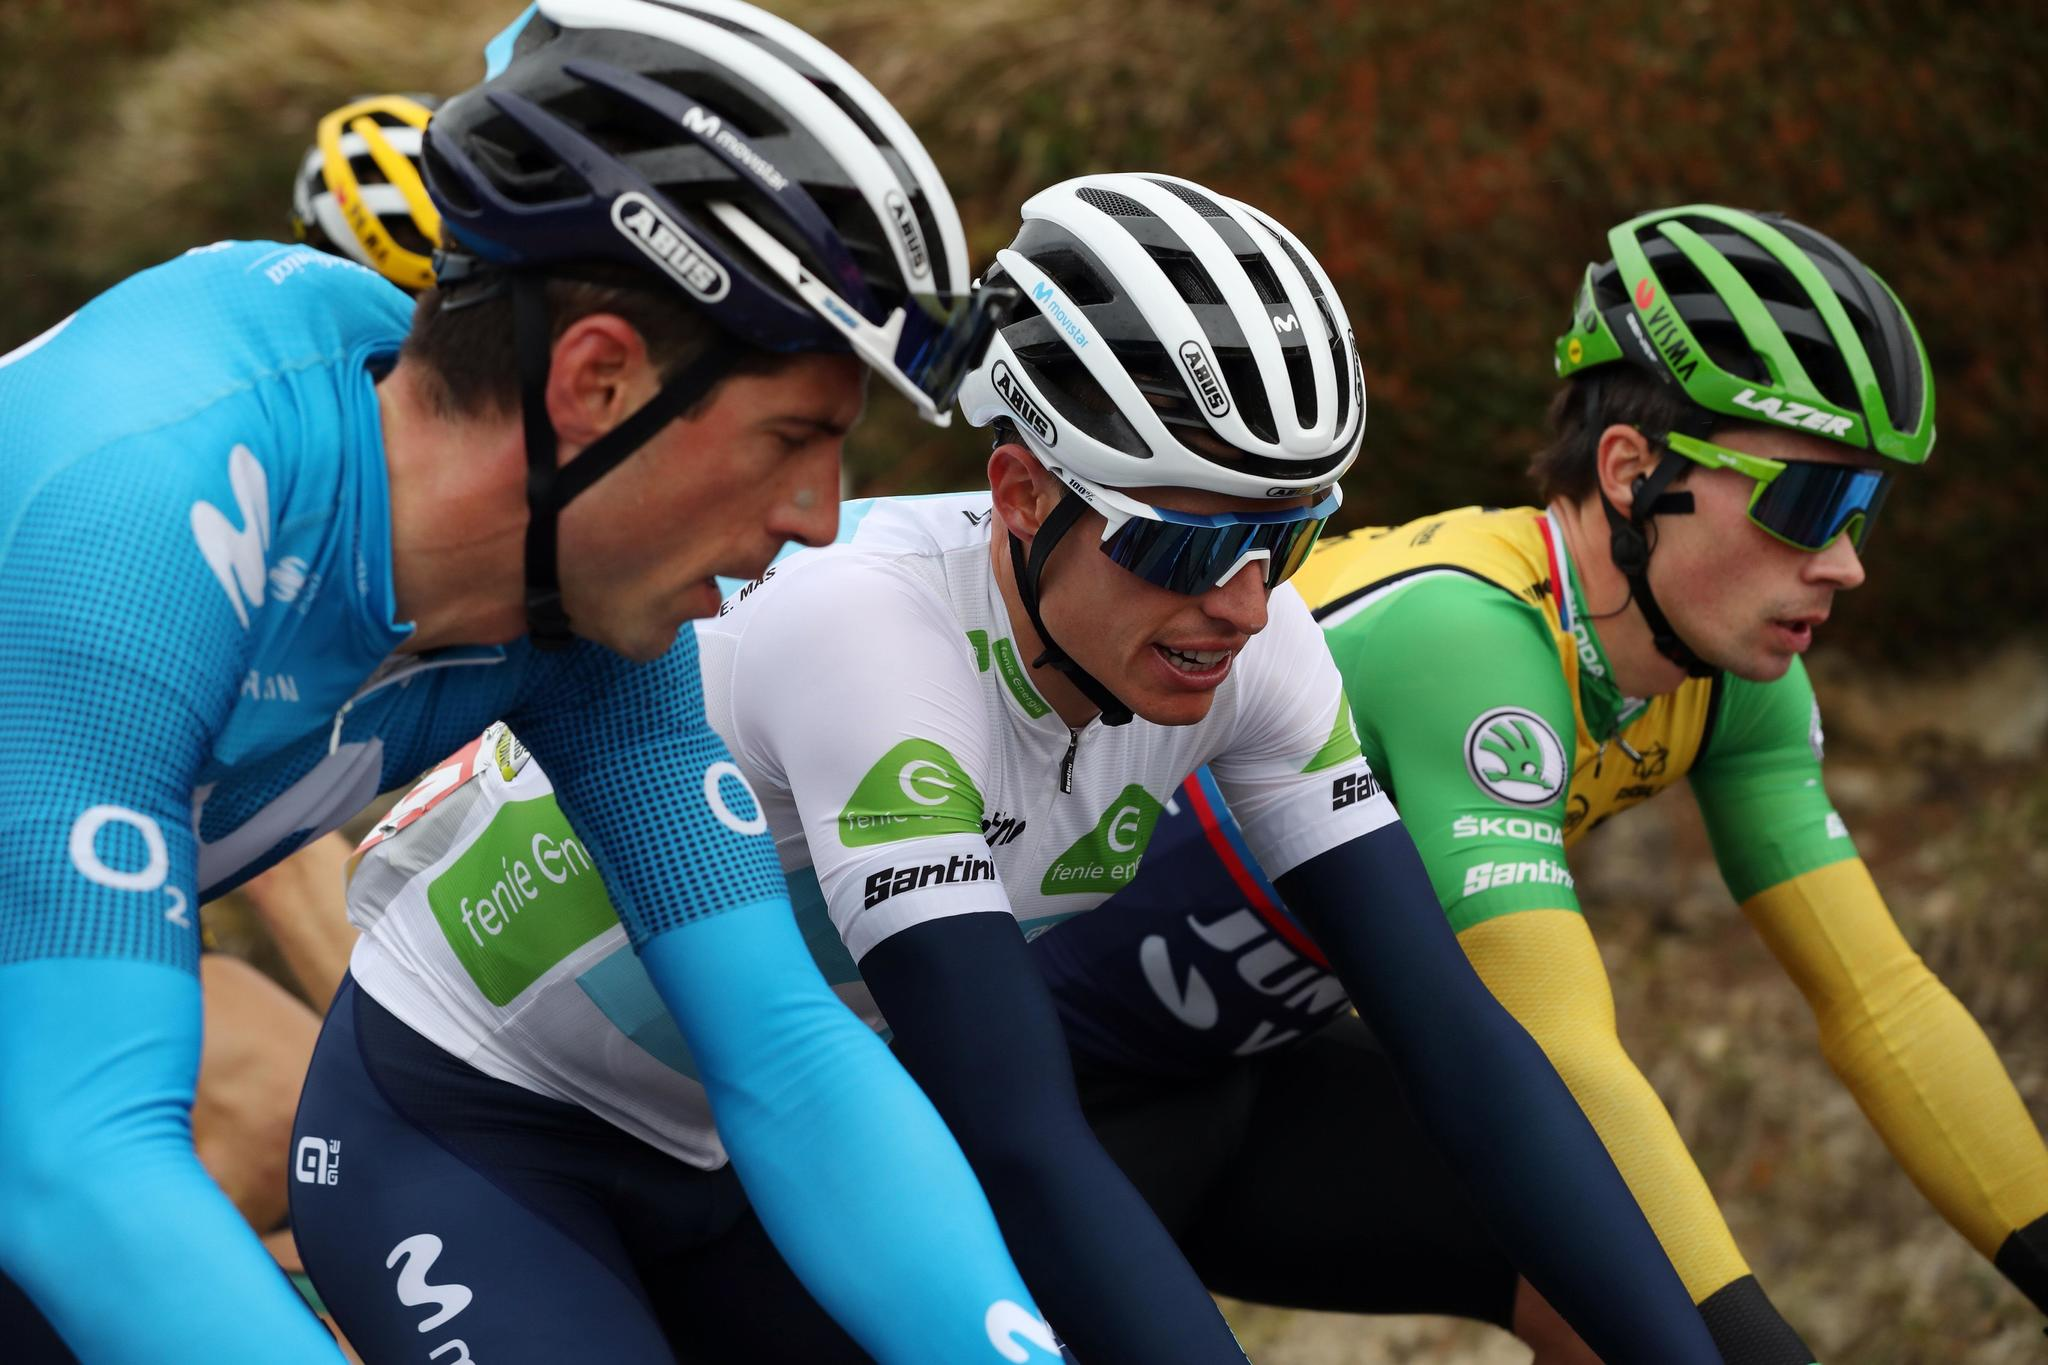 VILLANUEVA DE VALDEGOVIA, 27/10/2020.- Enric Mas (Movistar) (c), y el esloveno Primoz <strong>Roglic</strong> (Jumbo Visma) (d) durante la séptima etapa de La lt;HIT gt;Vuelta lt;/HIT gt; ciclista a España disputada hoy entre Vitoria y Villanueva de Valdegovía, de 159,7km de recorrido. EFE/ Kiko Huesca